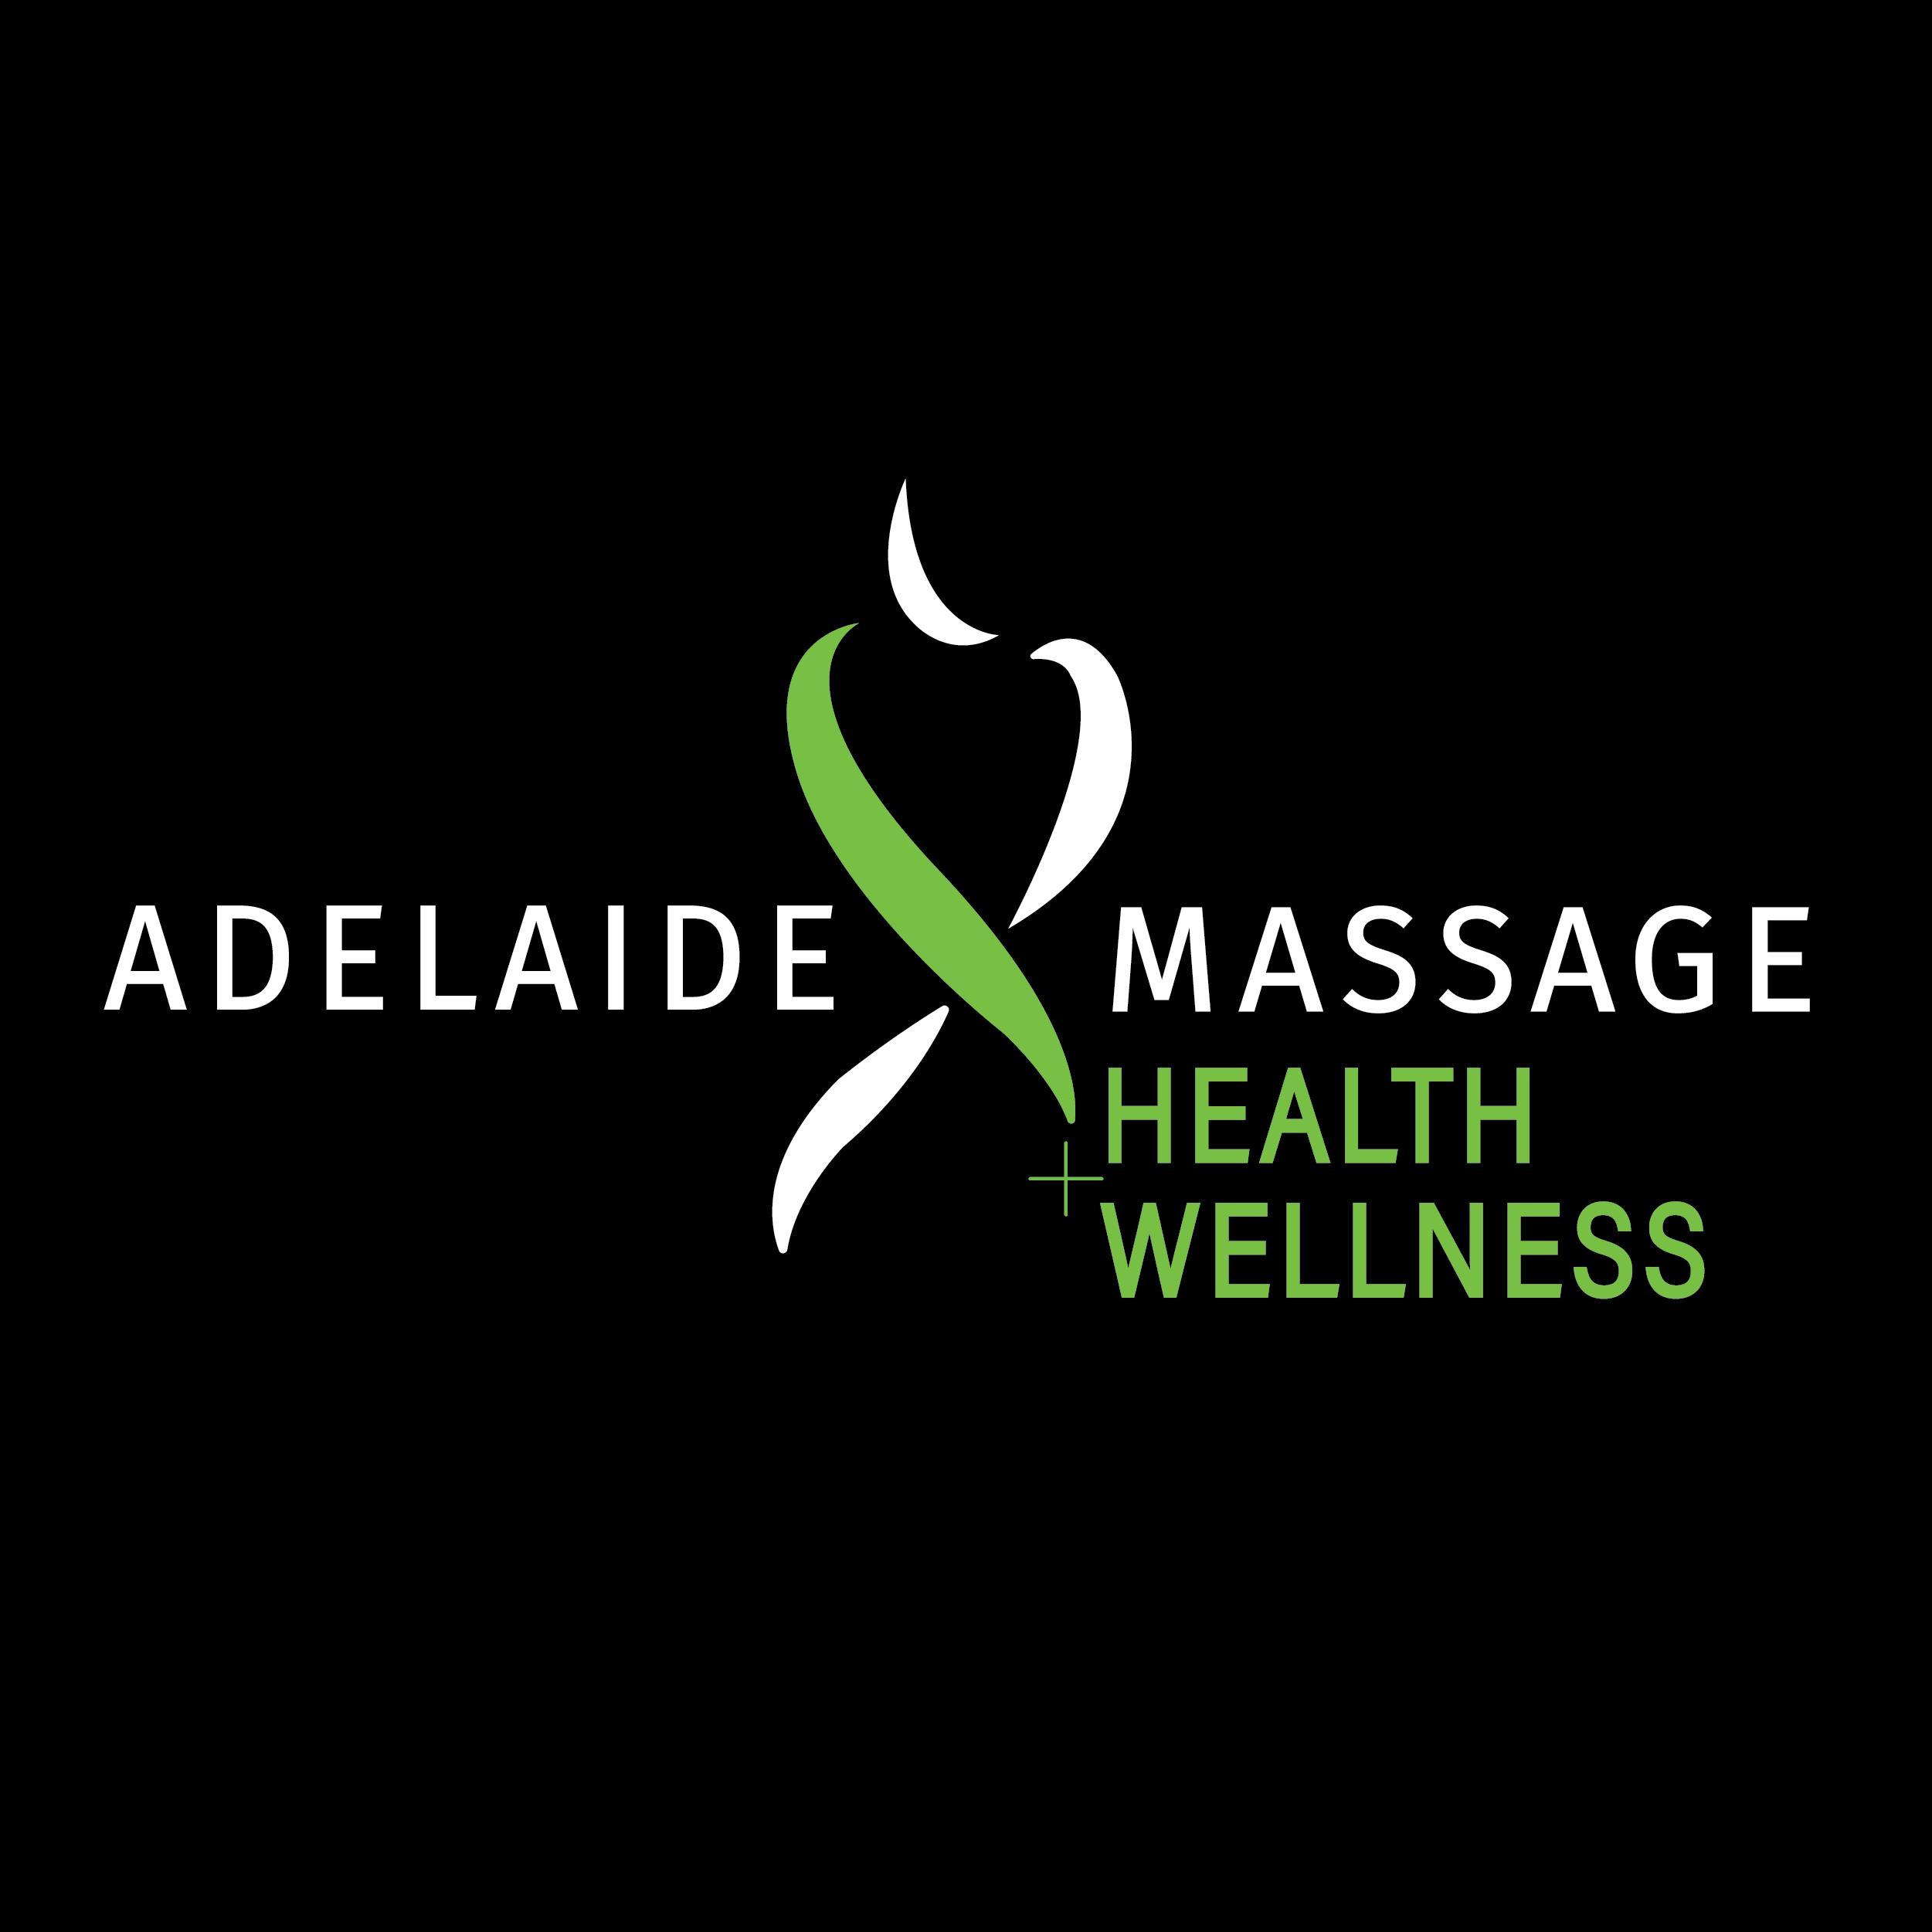 Adelaide Massage Health and Wellness